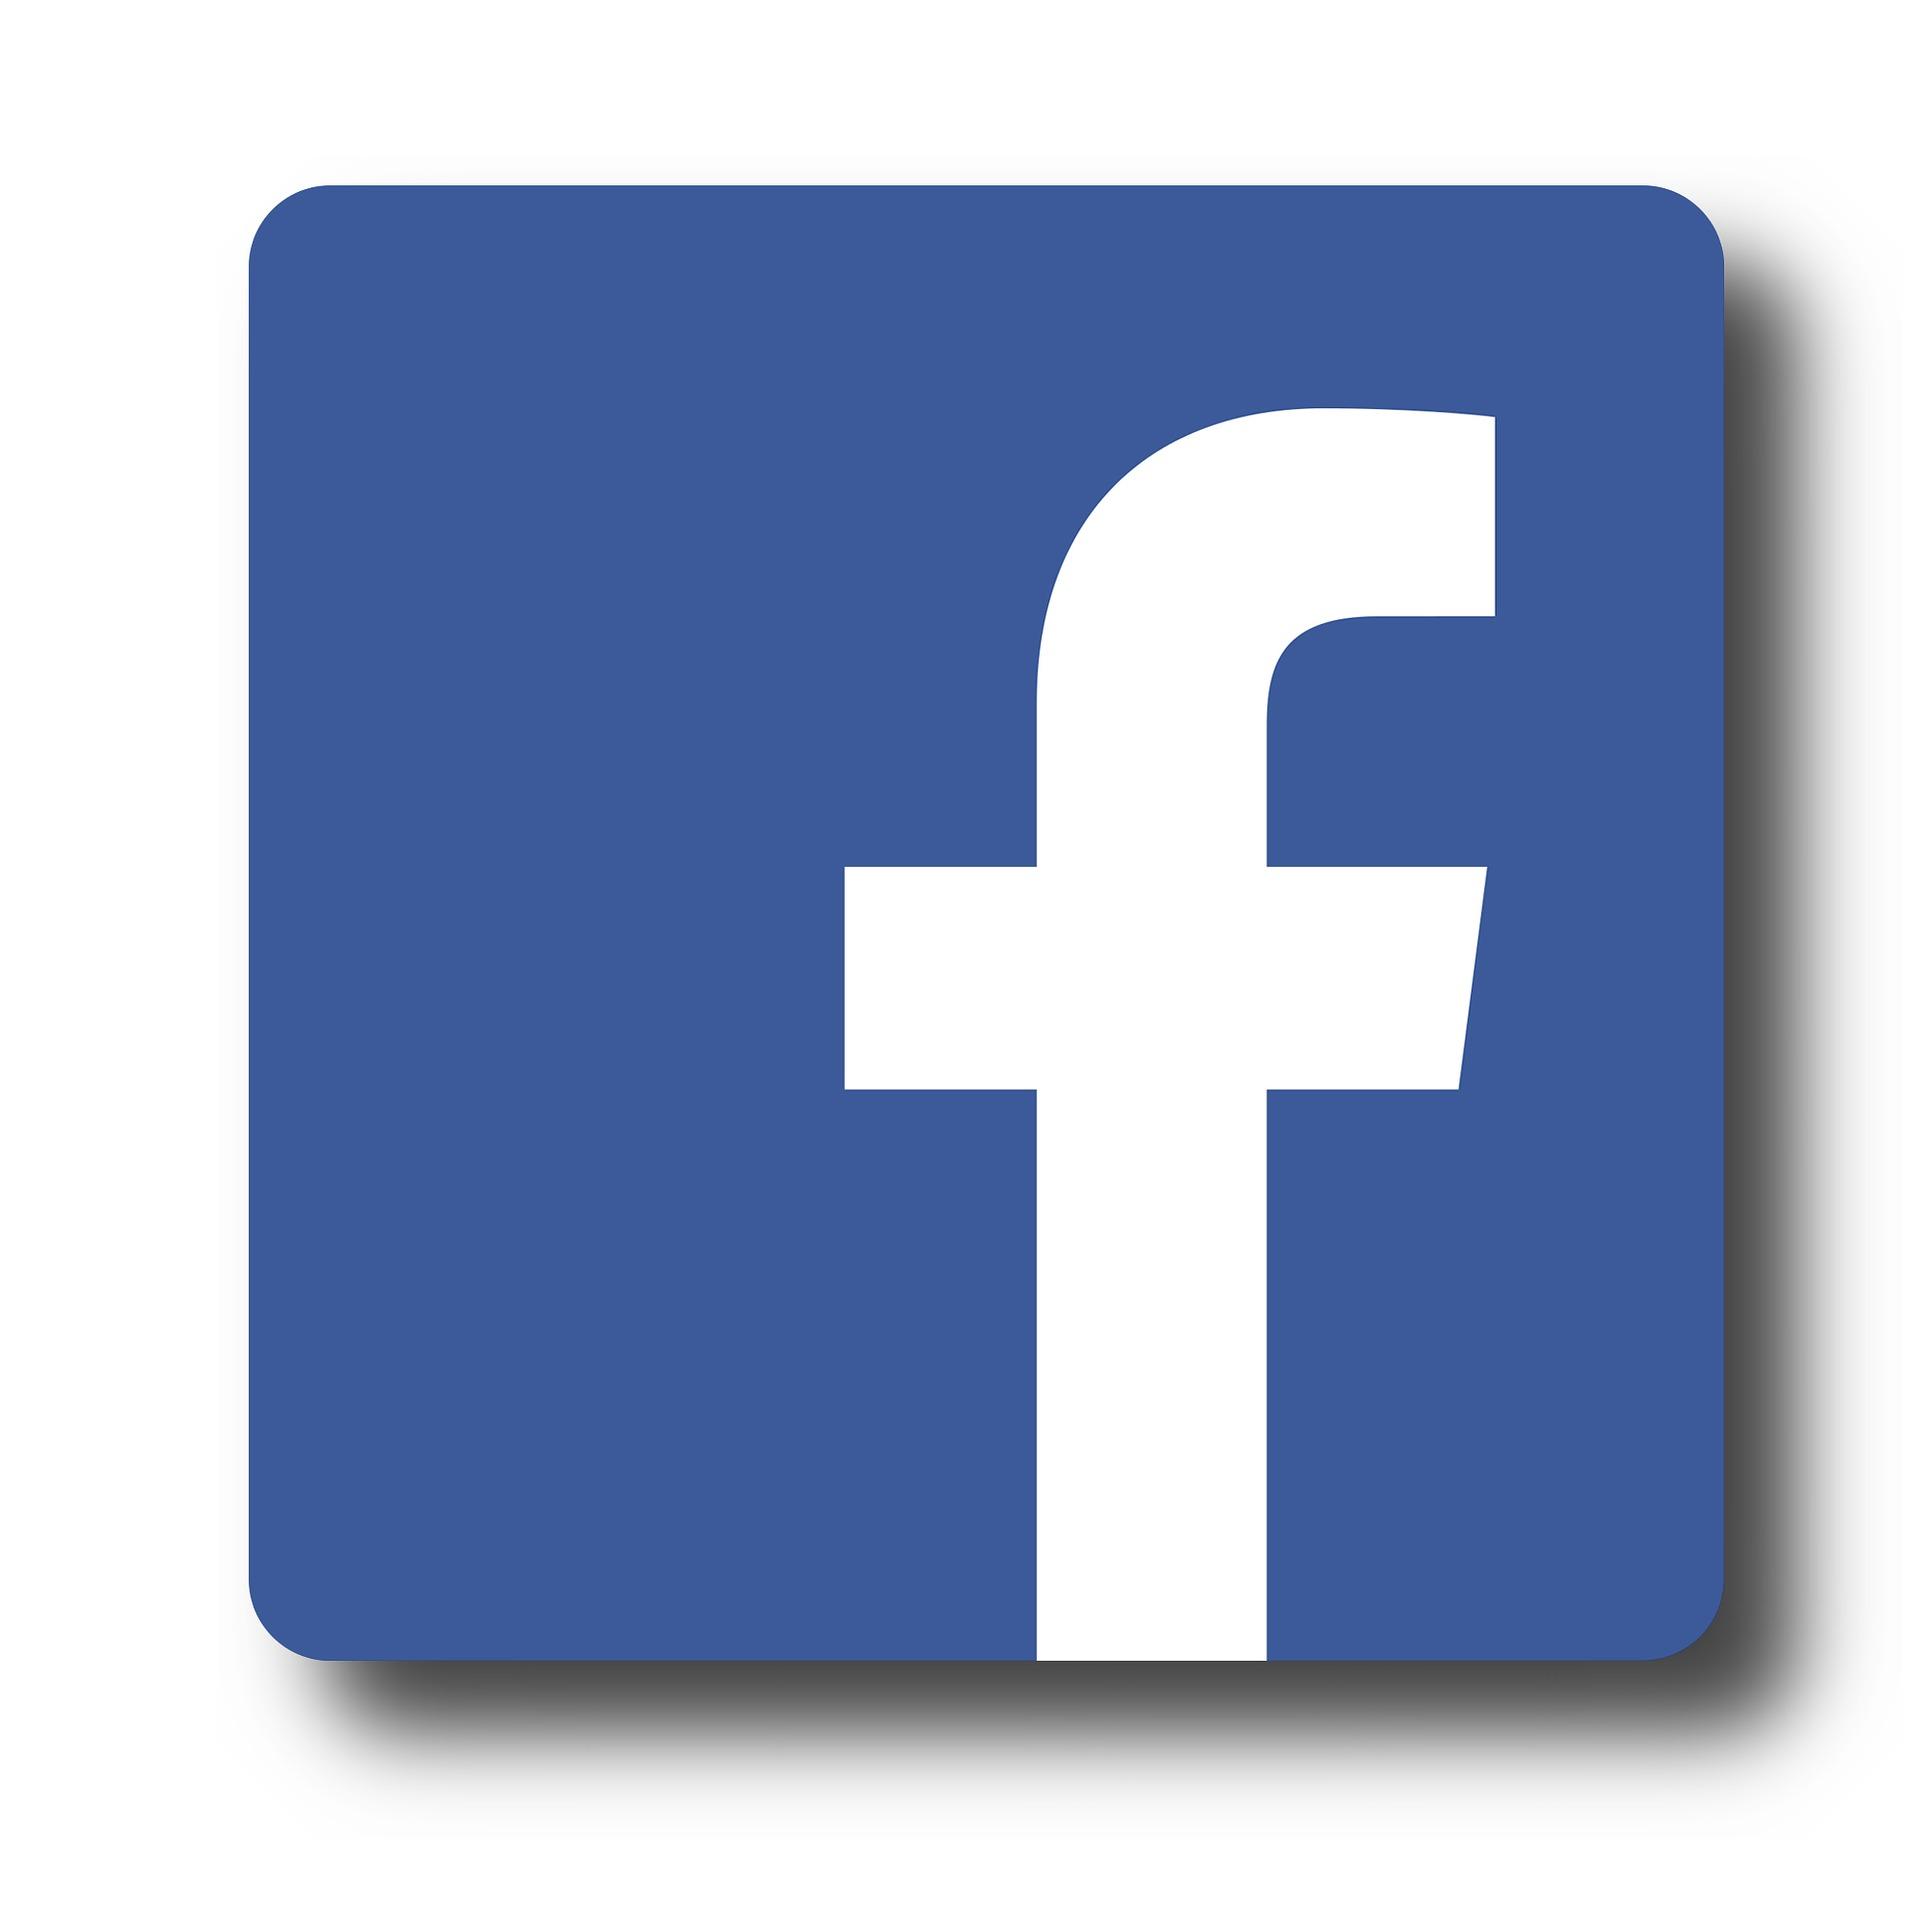 facebook-2815970_1920